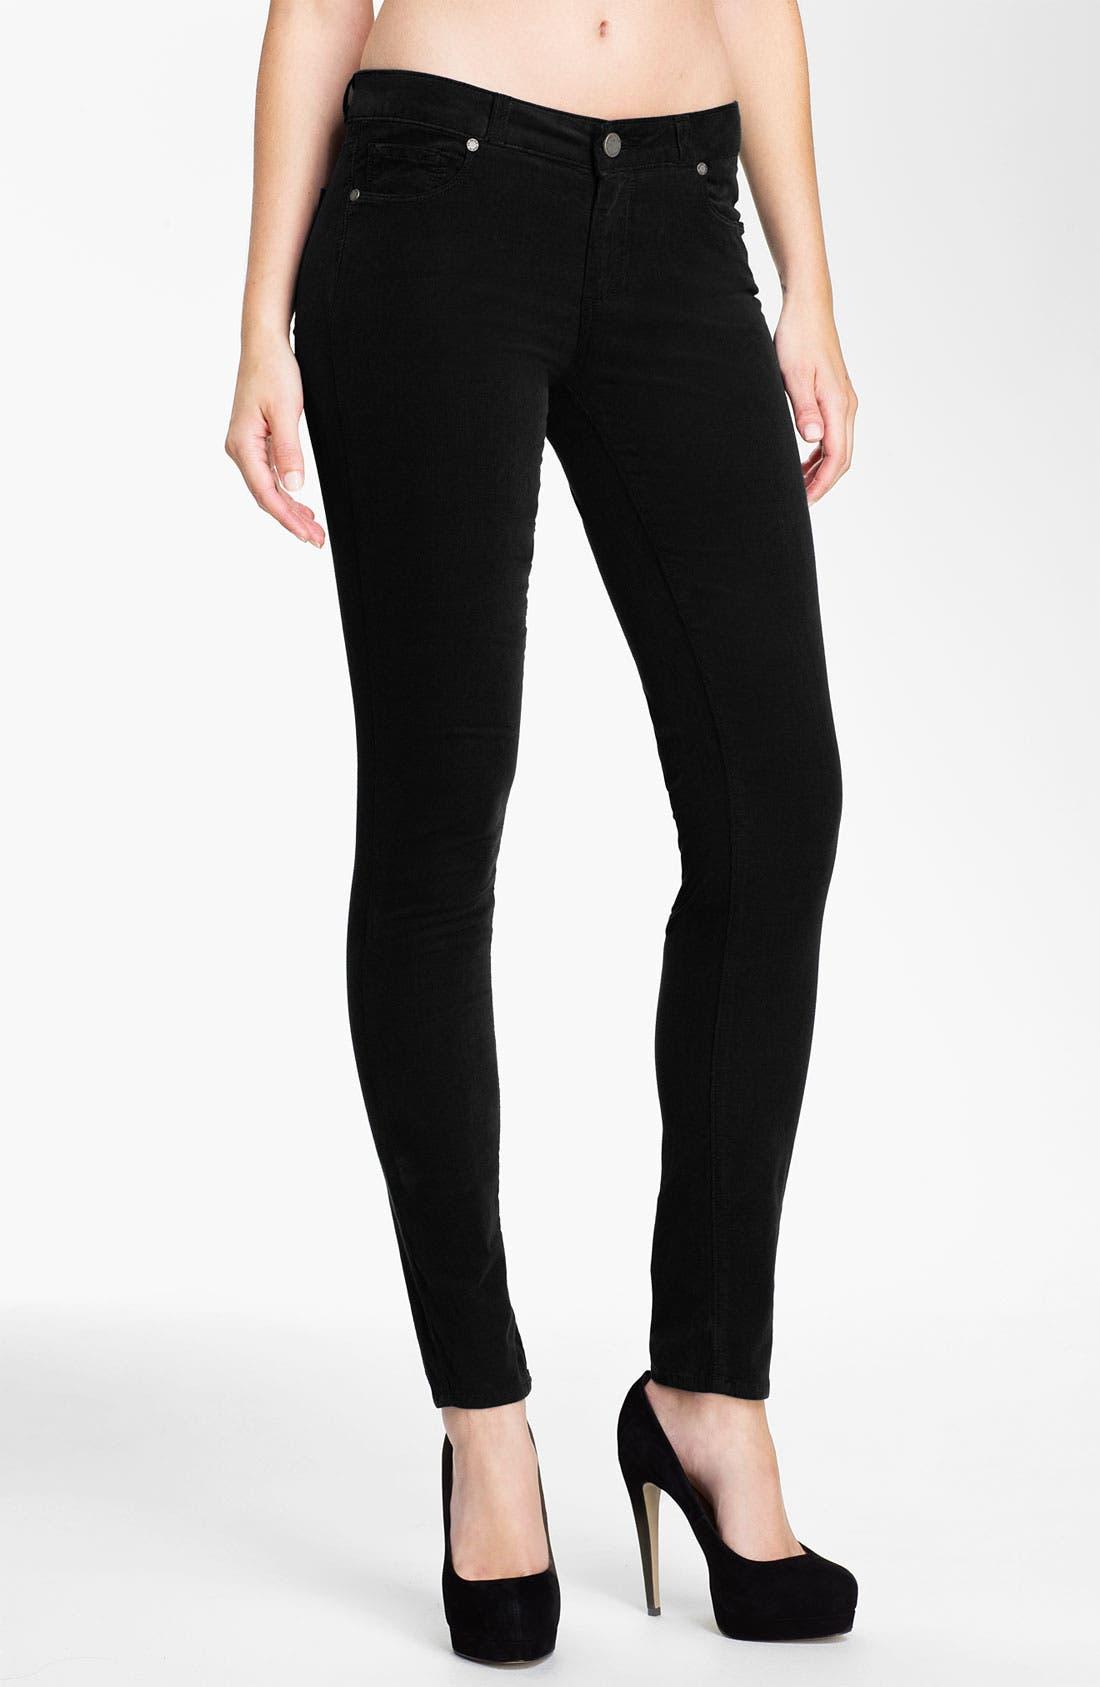 Main Image - Paige Denim 'Verdugo' Stretch Denim Skinny Jeans (Black)